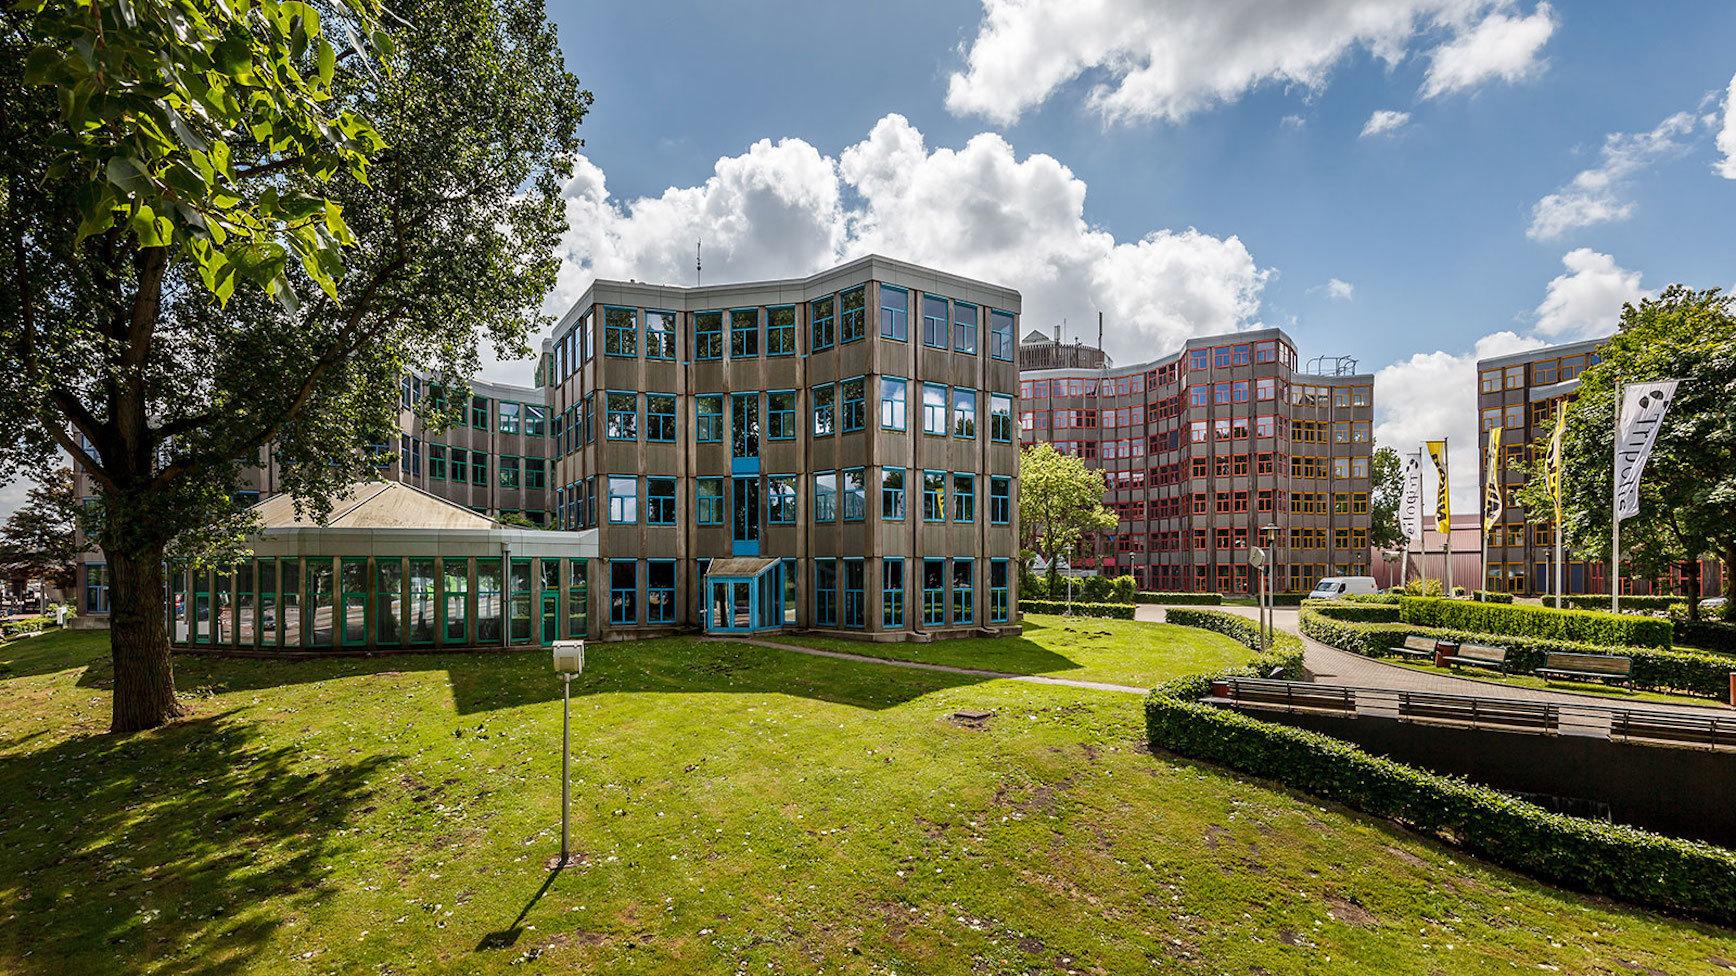 Impression of Amsterdam South